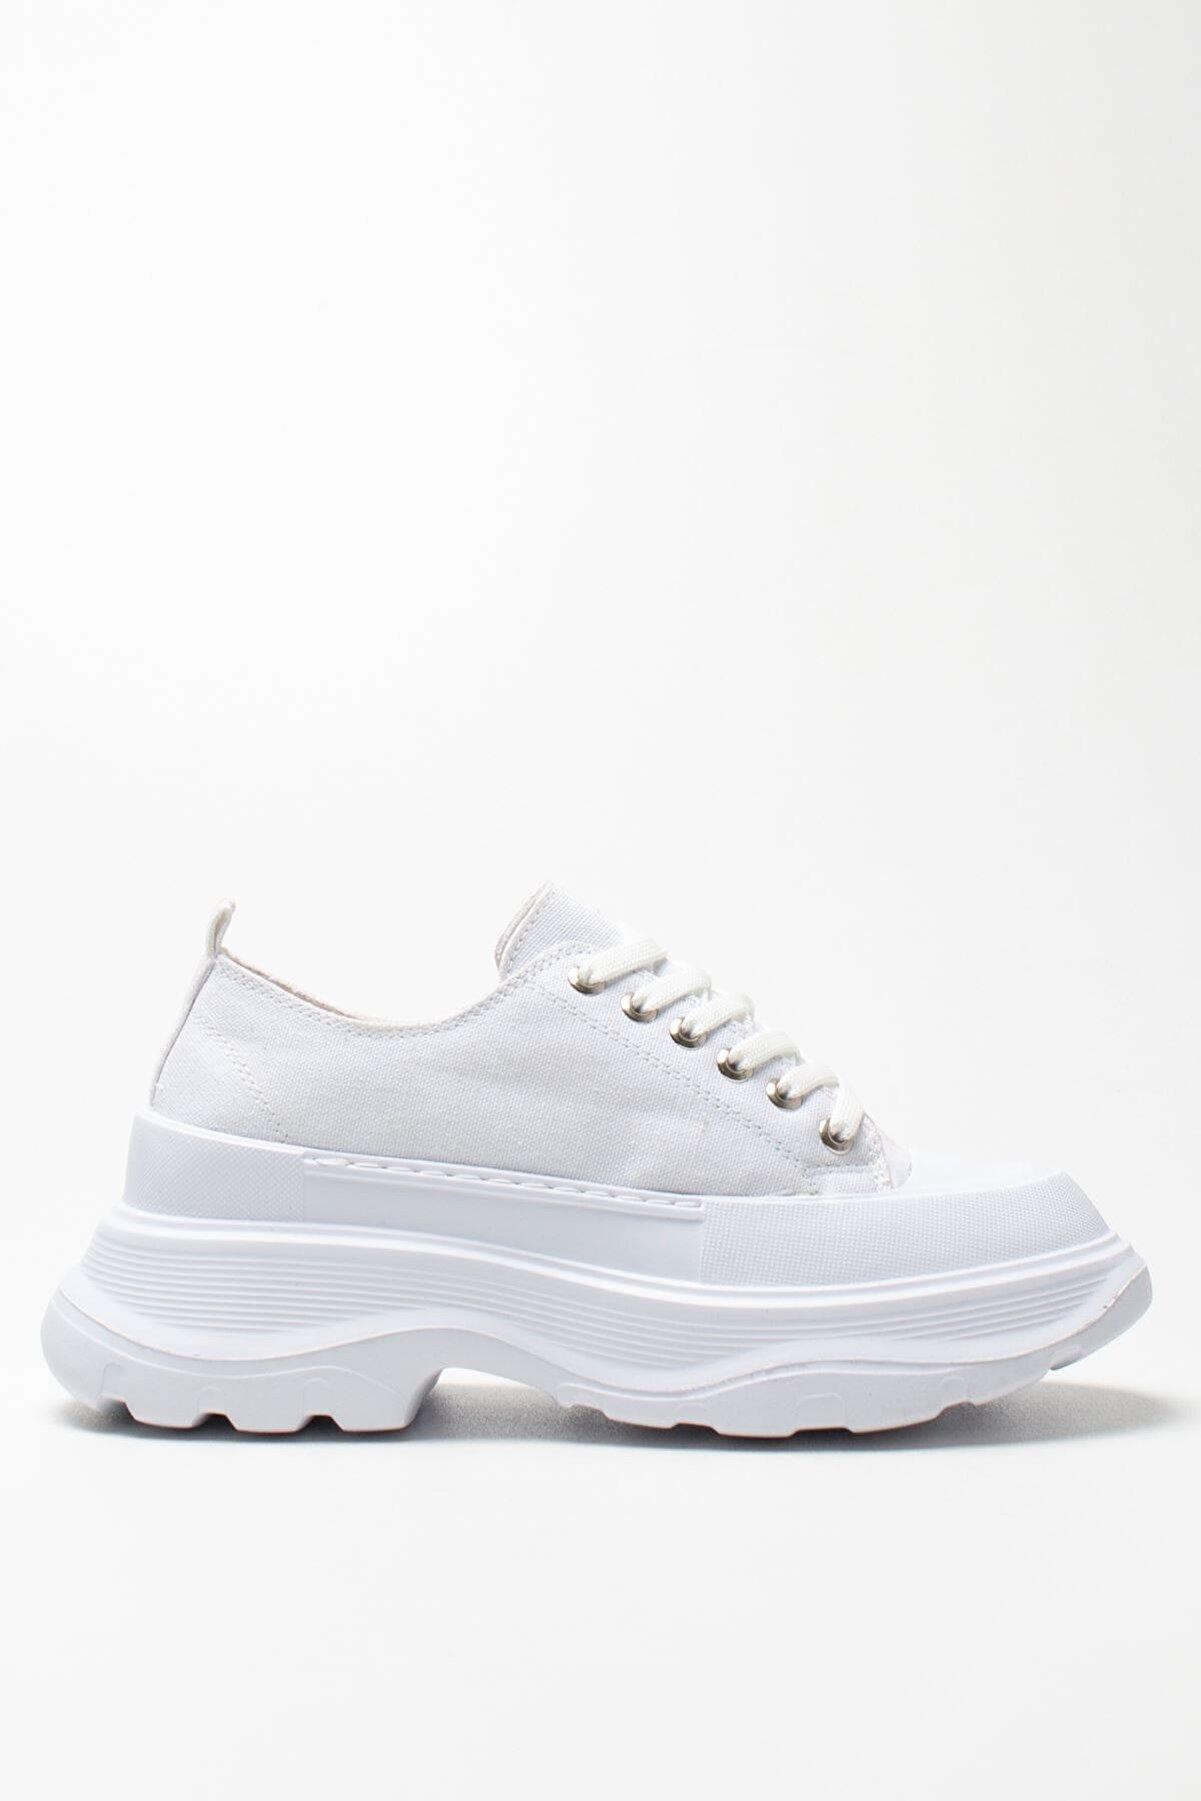 Louis Cardy Kadın Beyaz Keten Sneakers